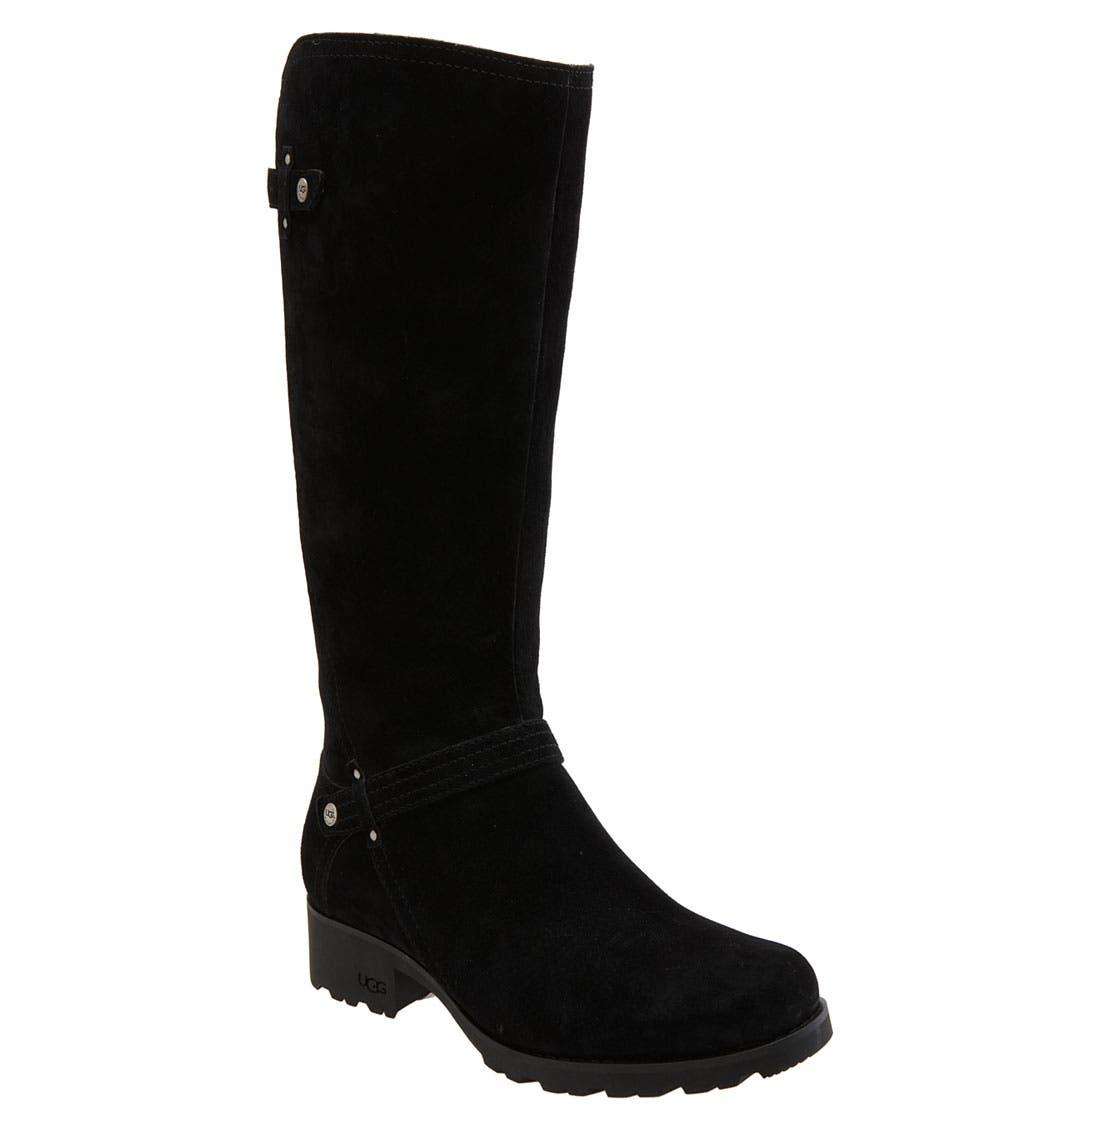 UGG<SUP>®</SUP> Australia 'Jillian' Riding Boot, Main, color, 001